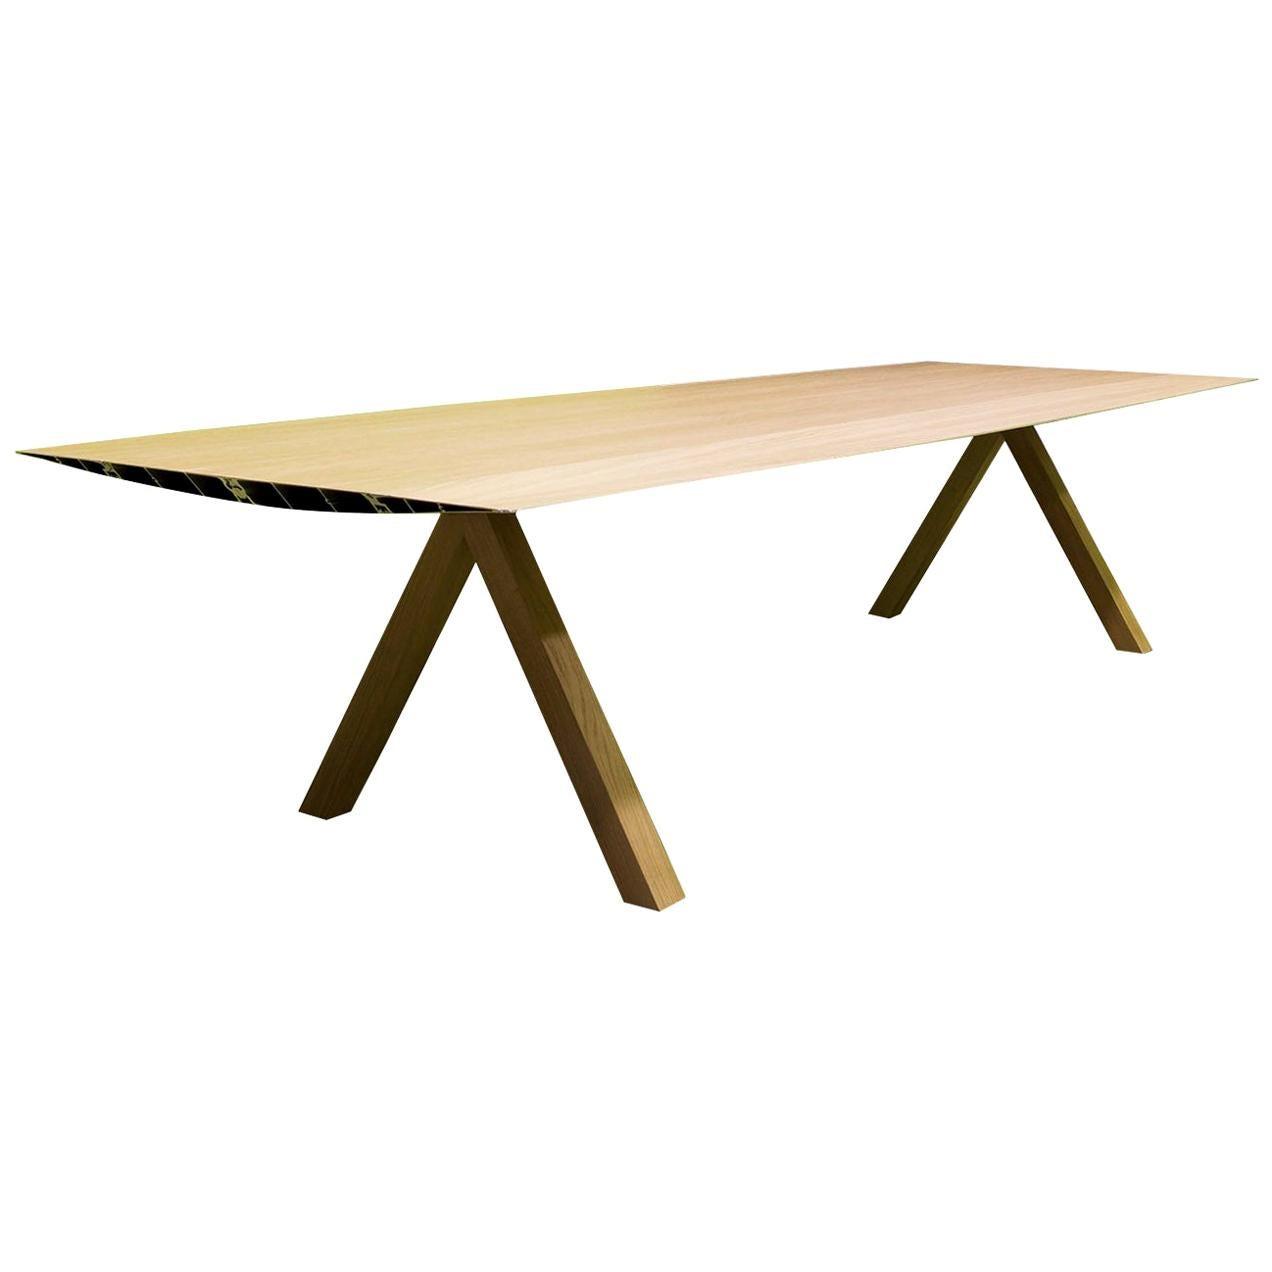 Konstantin Grcic, Contemporary Laminated Aluminium Wood Legs 360 Large B Table